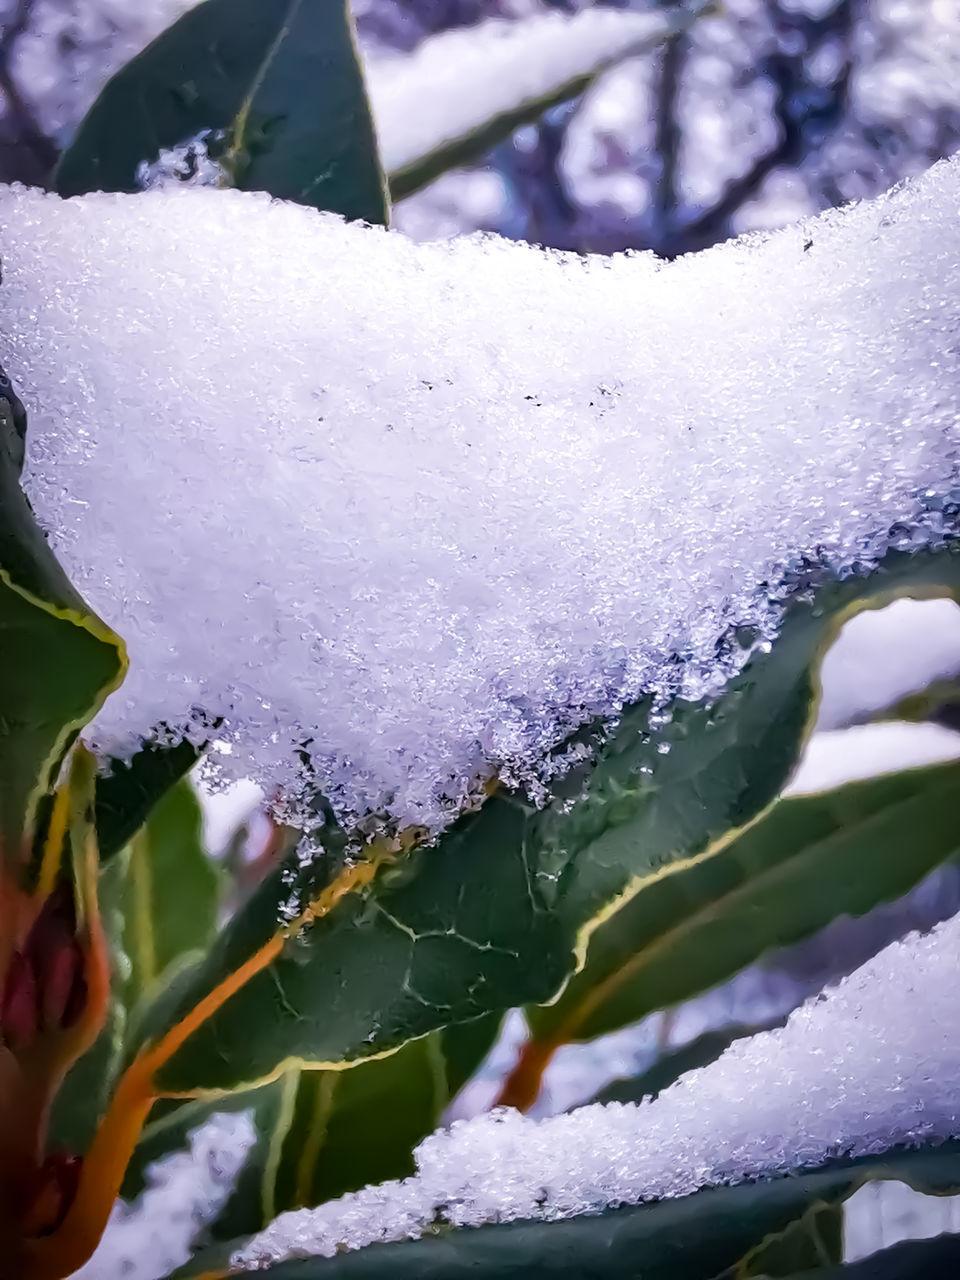 CLOSE-UP OF RAINDROPS ON SNOW